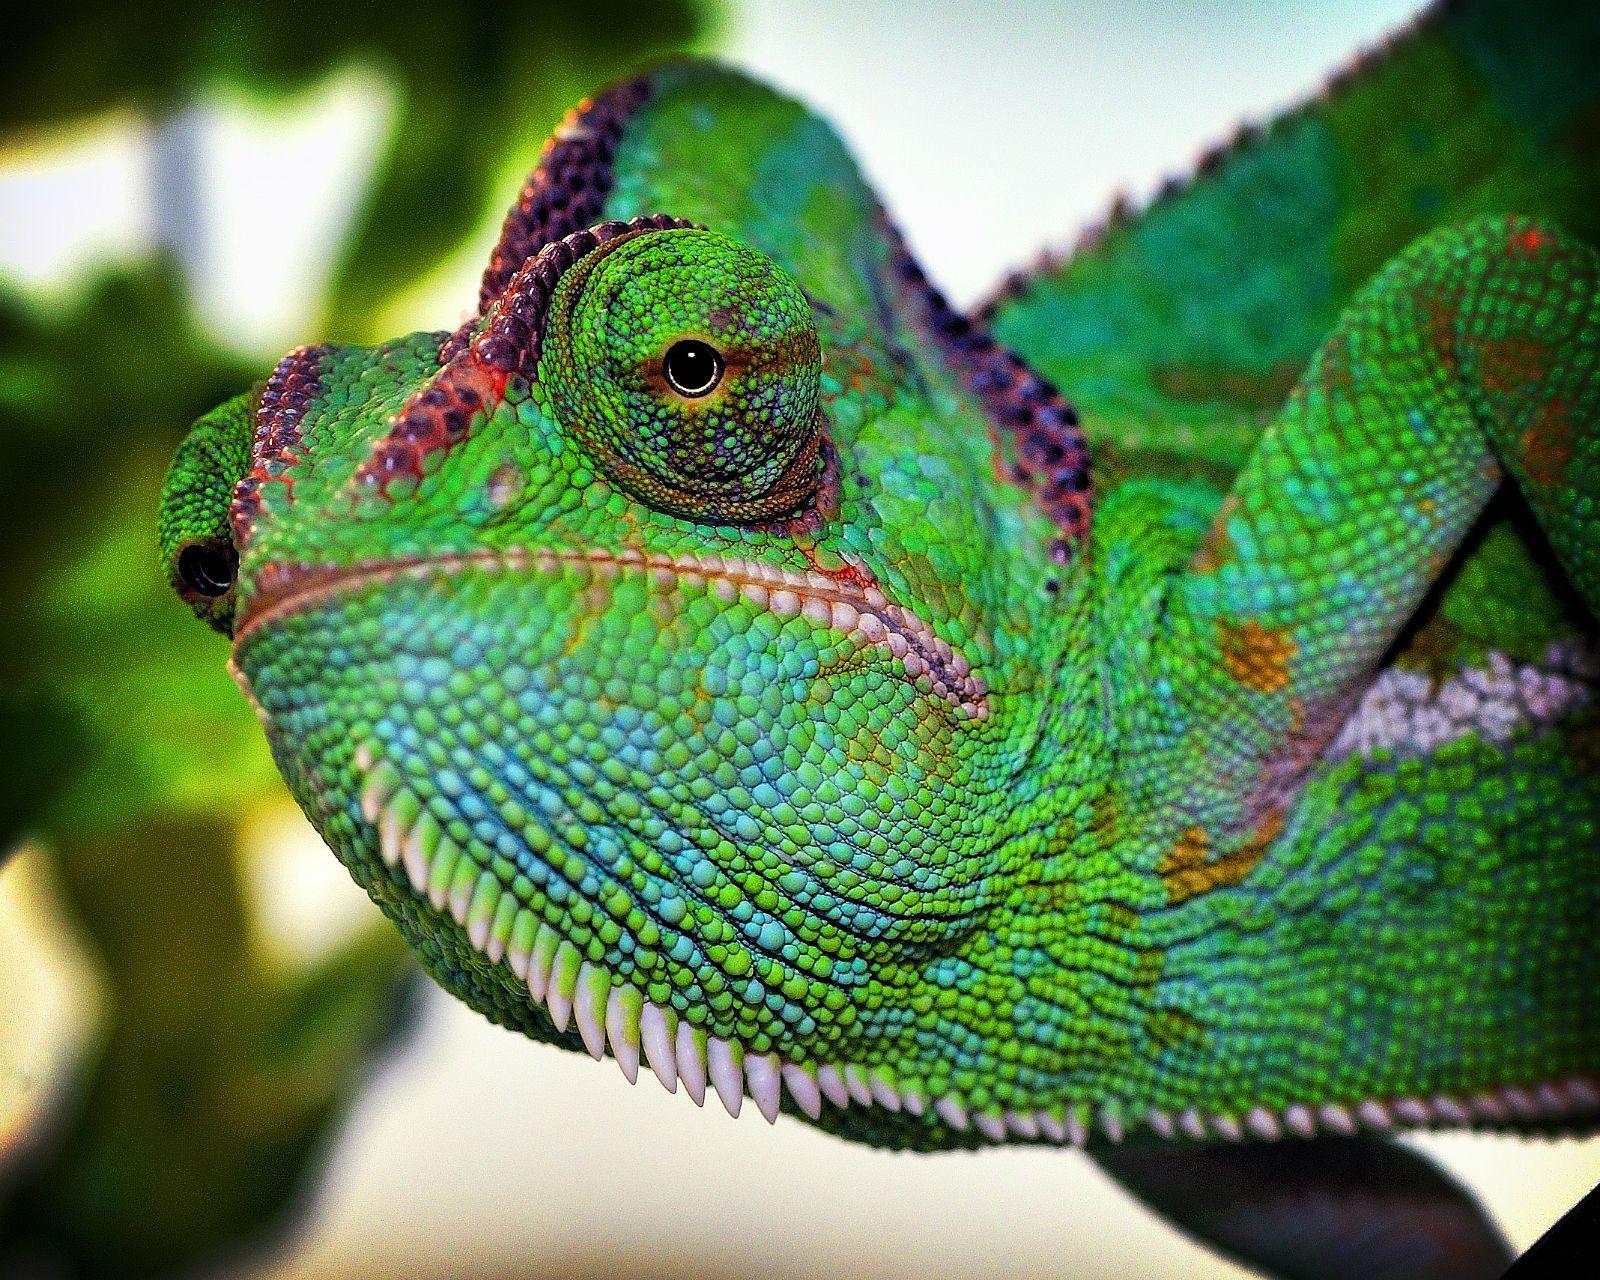 Yemen chameleon at Northampton Reptile Centre Reptiles